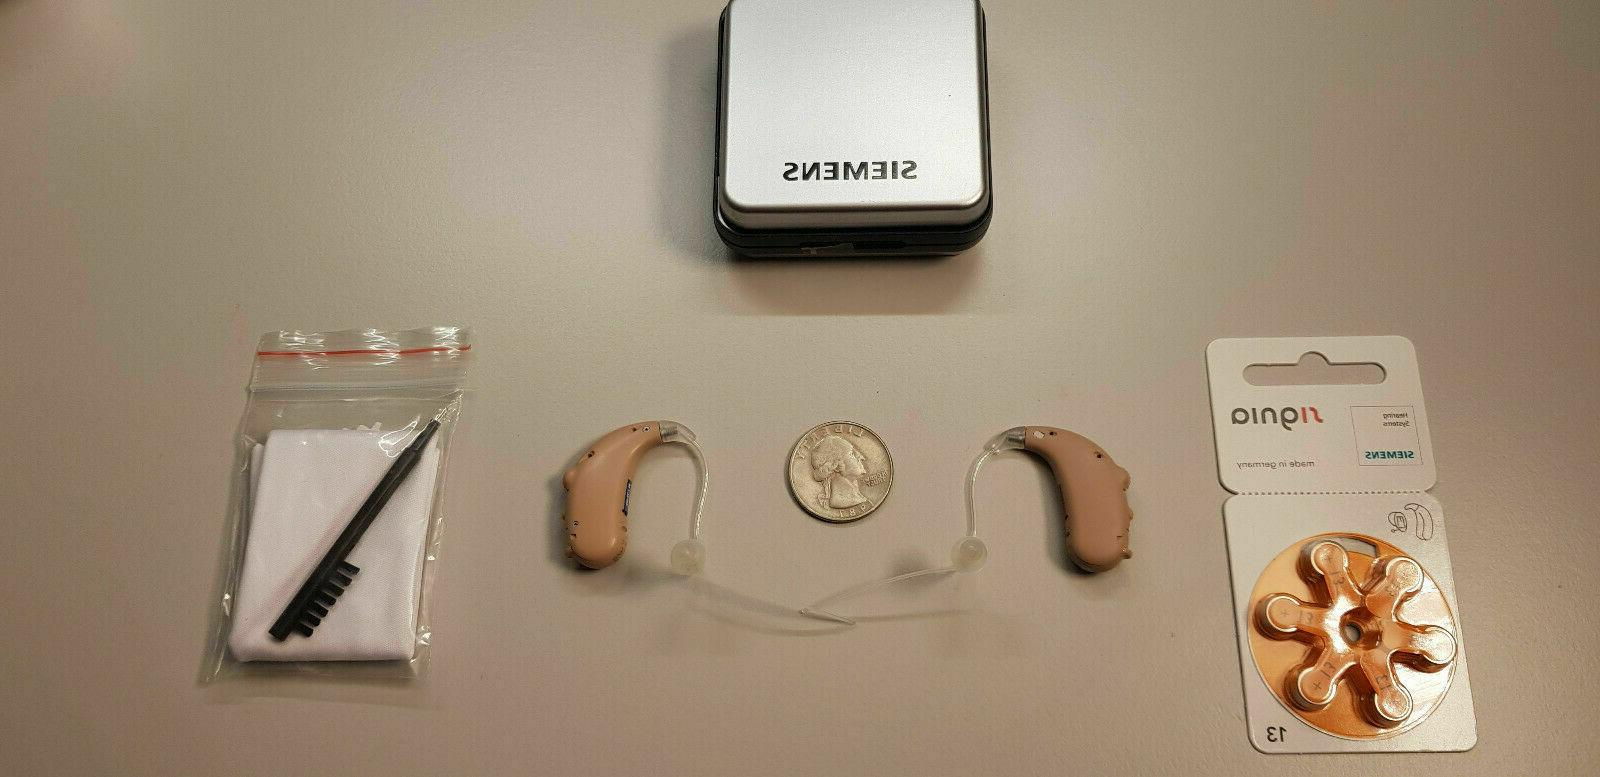 2xdigital hearing aids siemens impact m open